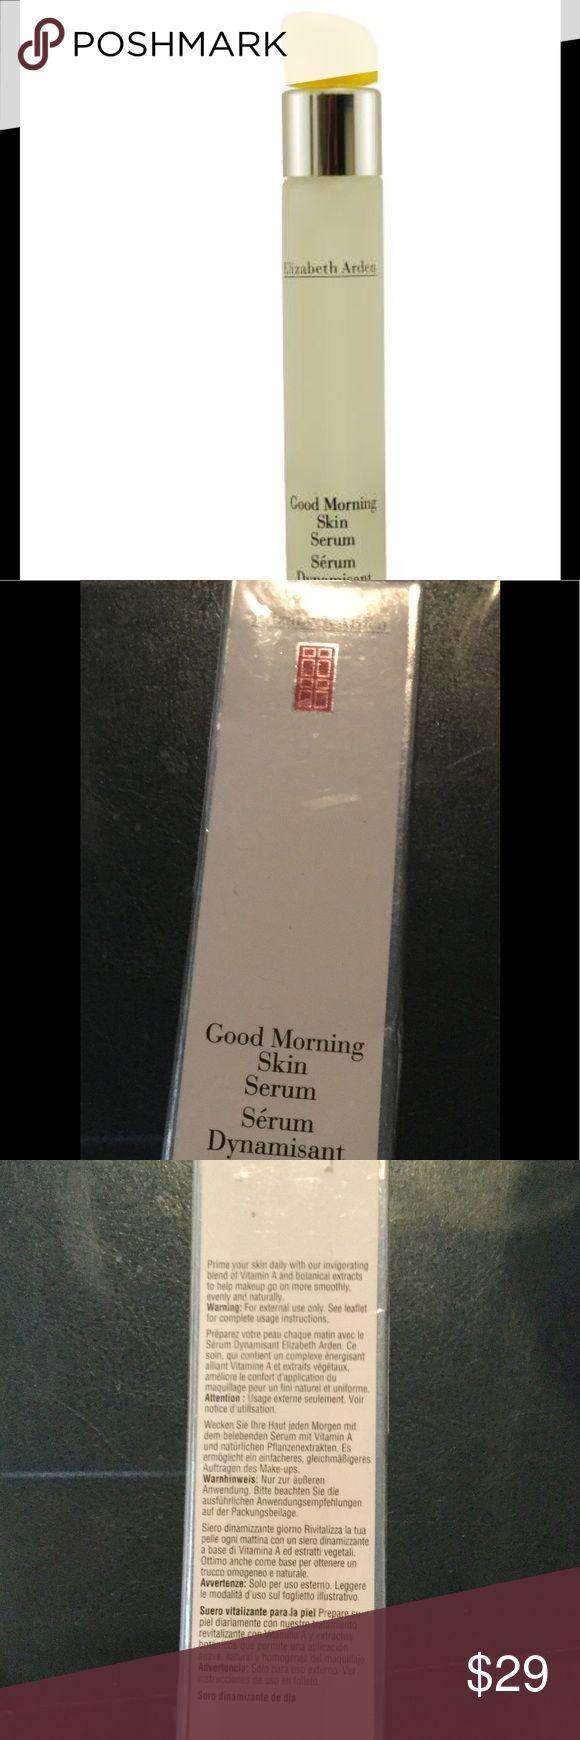 Elizabeth Arden Good Morning Skin Serum, 0.5-Oz Brand New - A daily morning primer that helps skin look and feel instantly smoother. Elizabeth Arden Makeup Face Primer